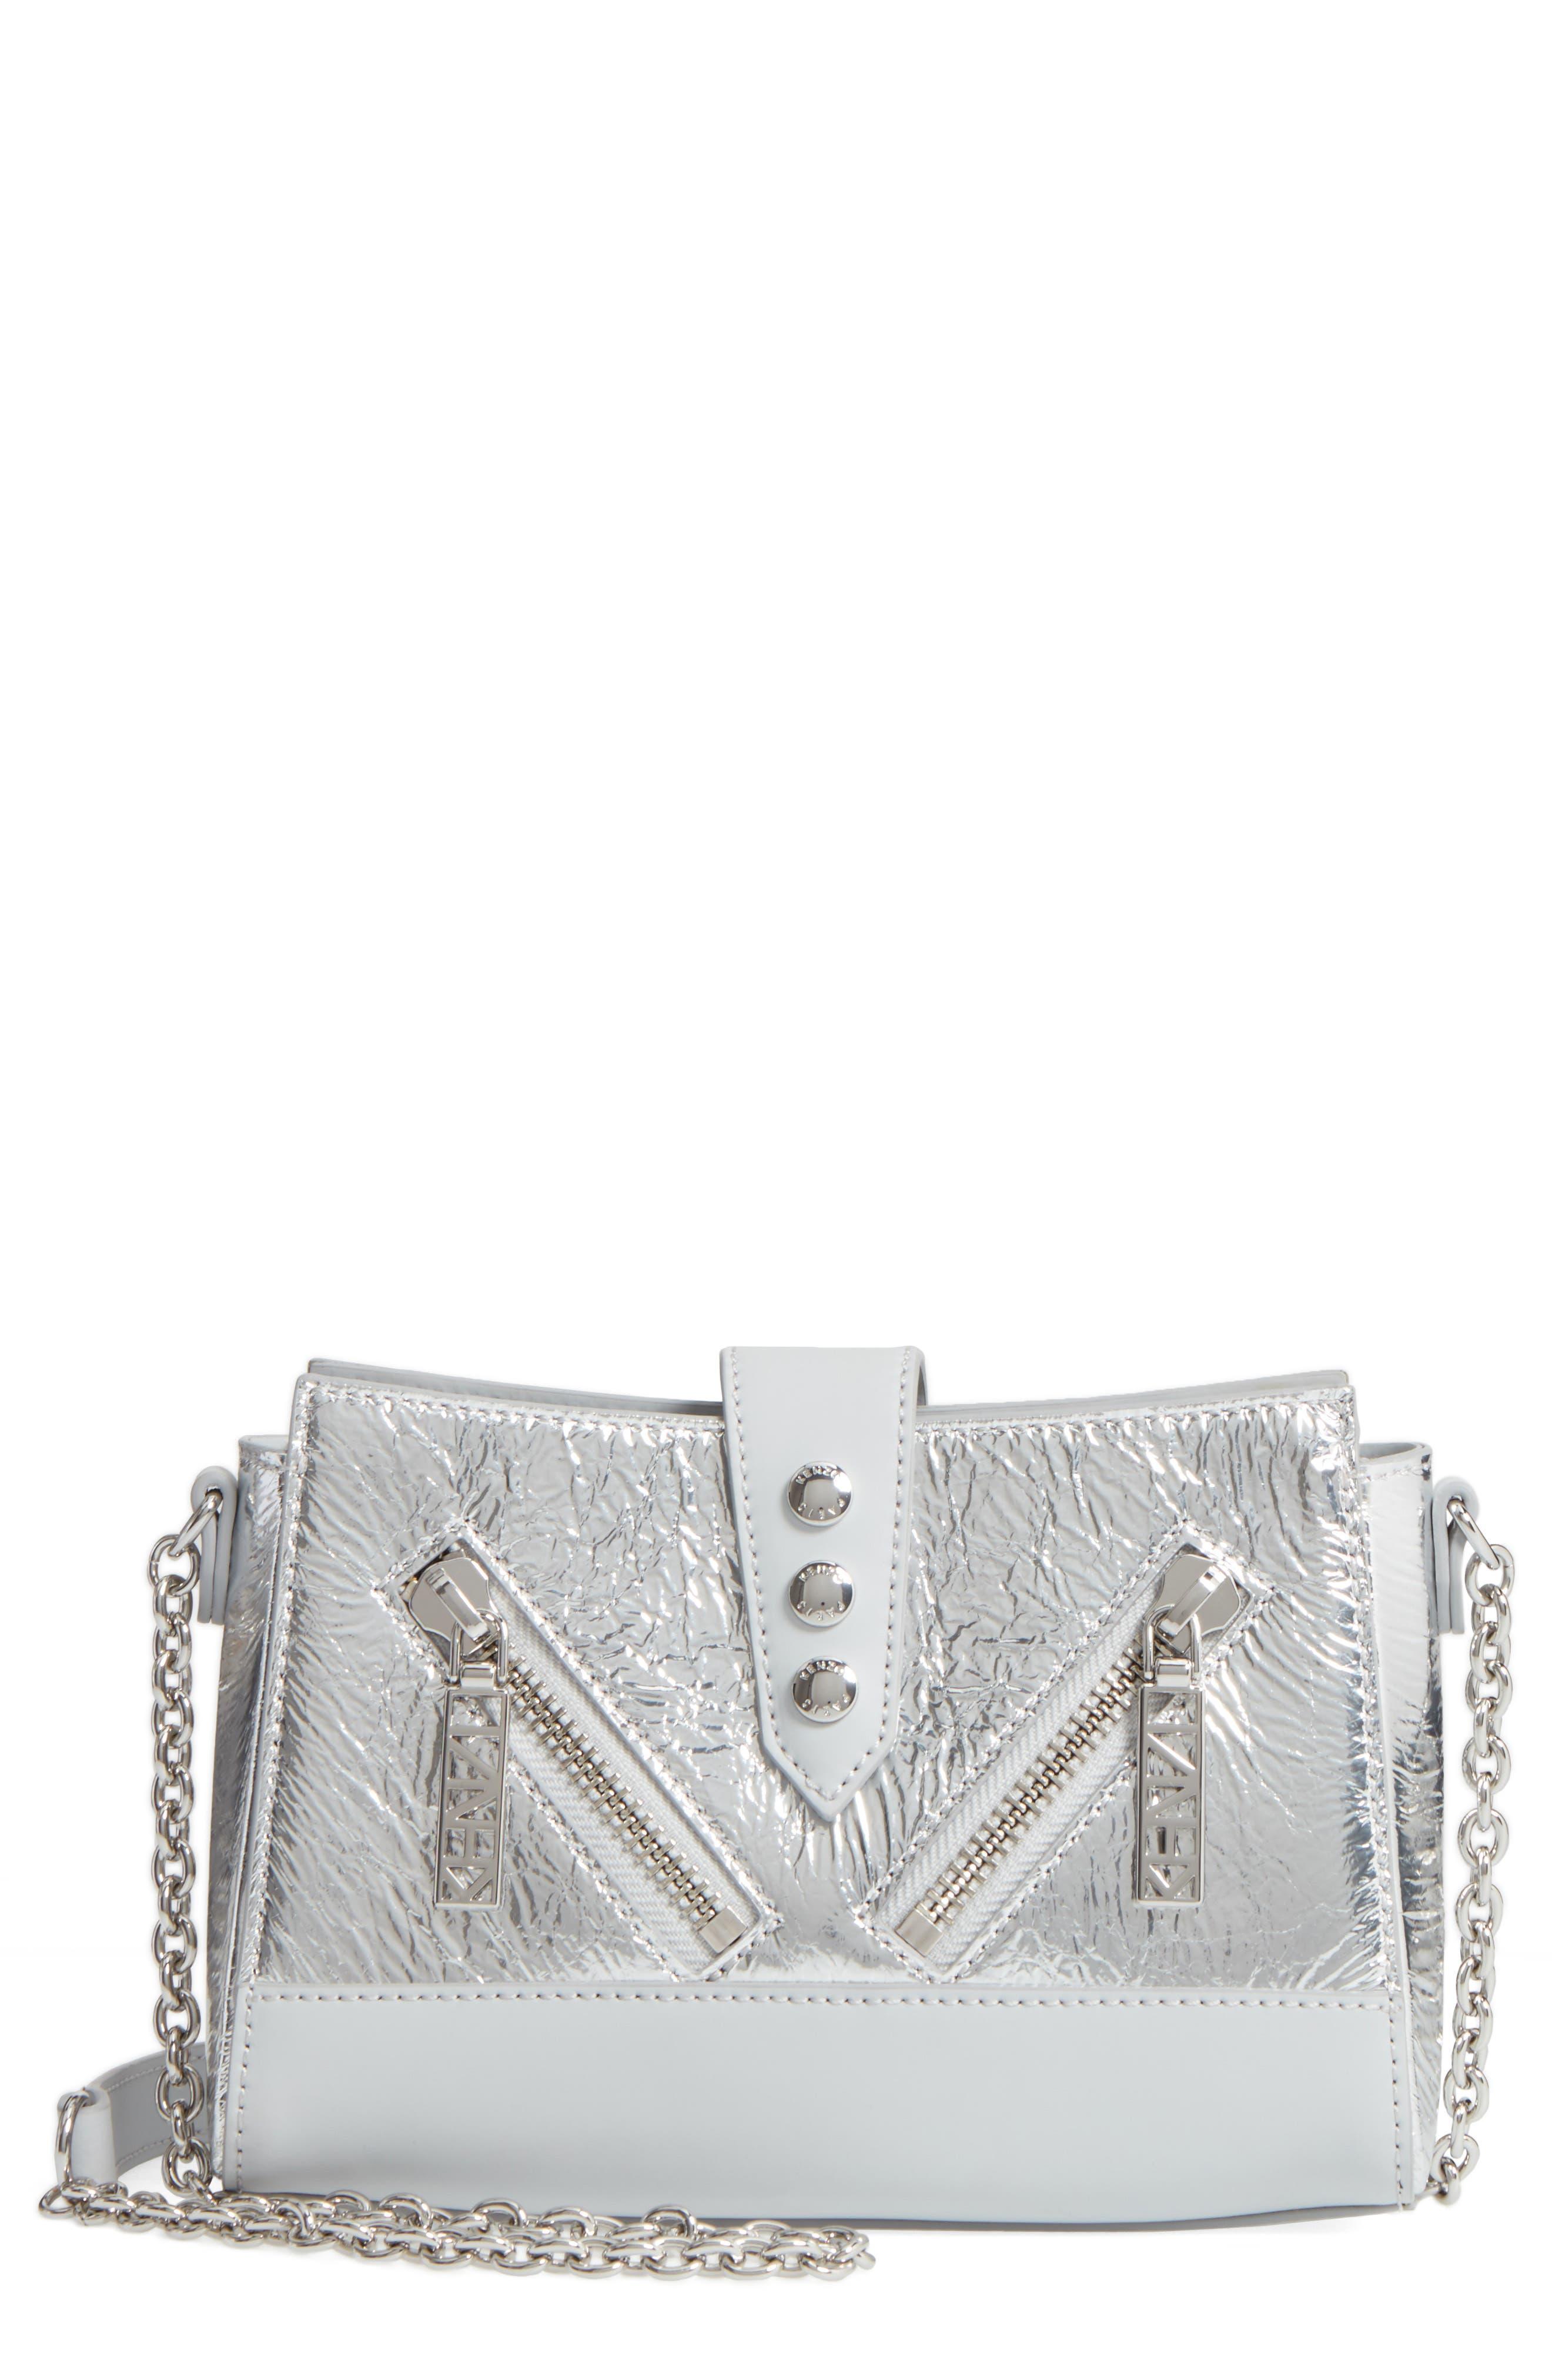 KENZO Mini Kalifornia Metallic Leather Crossbody Bag